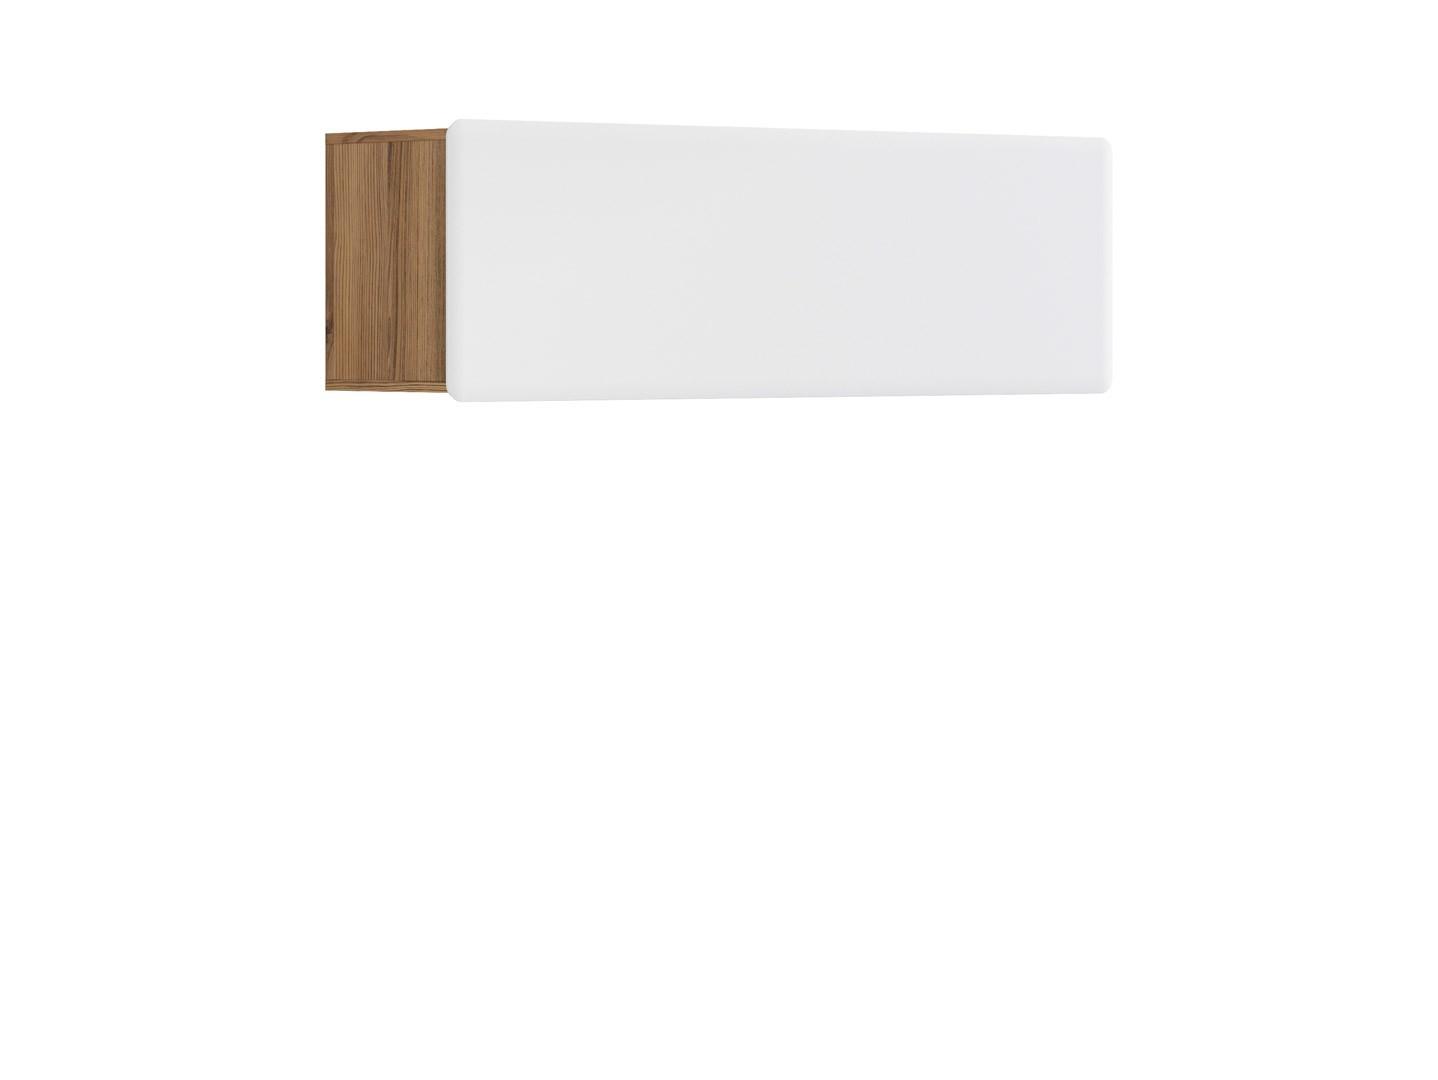 Polička - BRW - Possi Light - SFW1K/4/13 (modřín sibiu zlatý + lesk bílý)